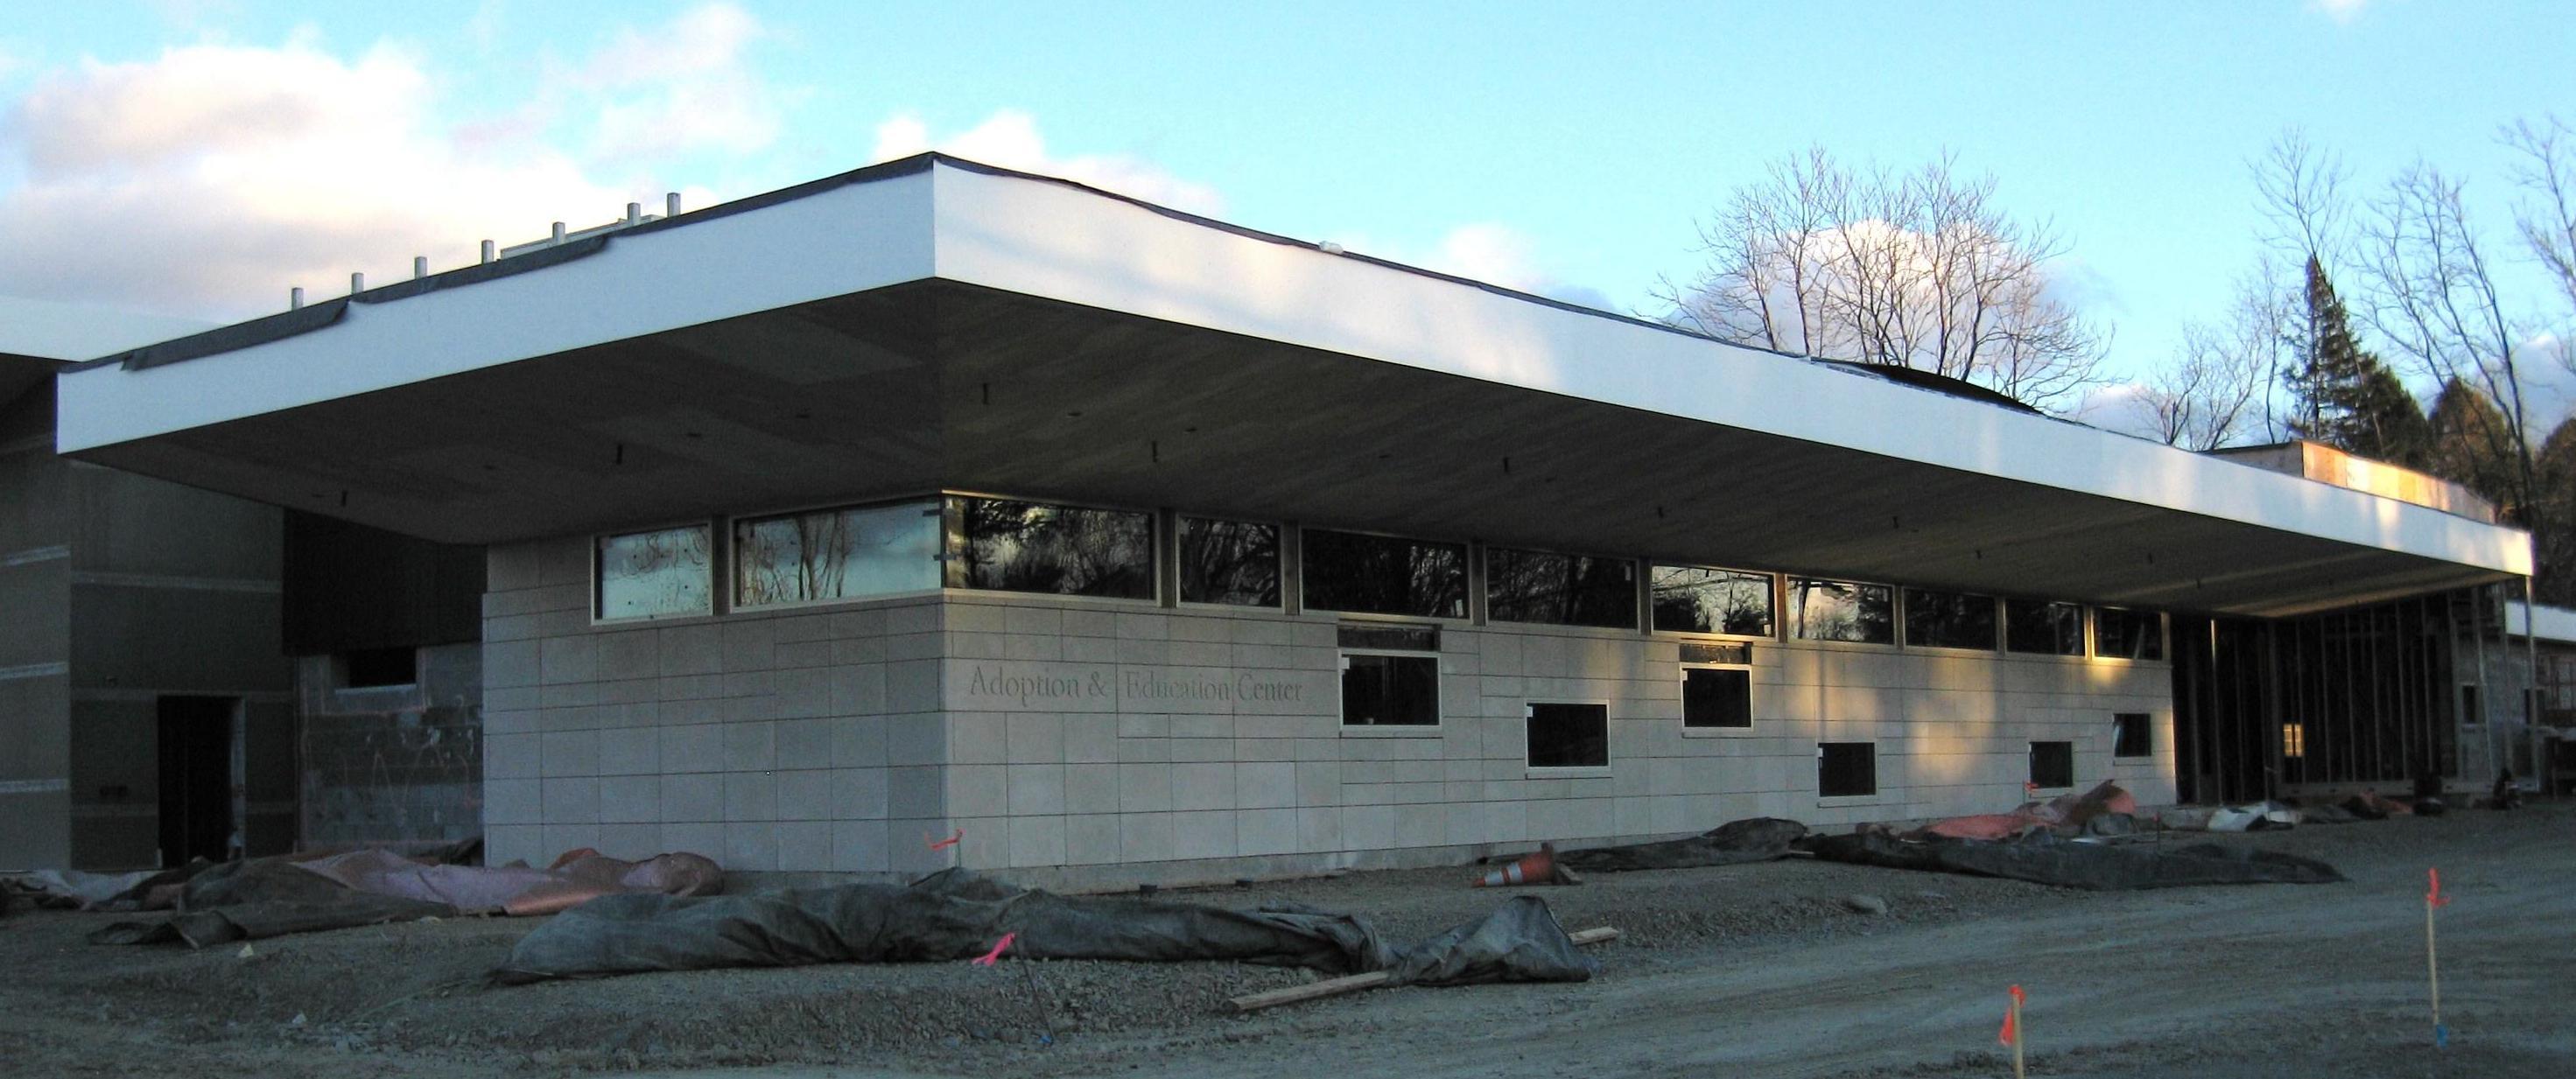 DCSPCA new building